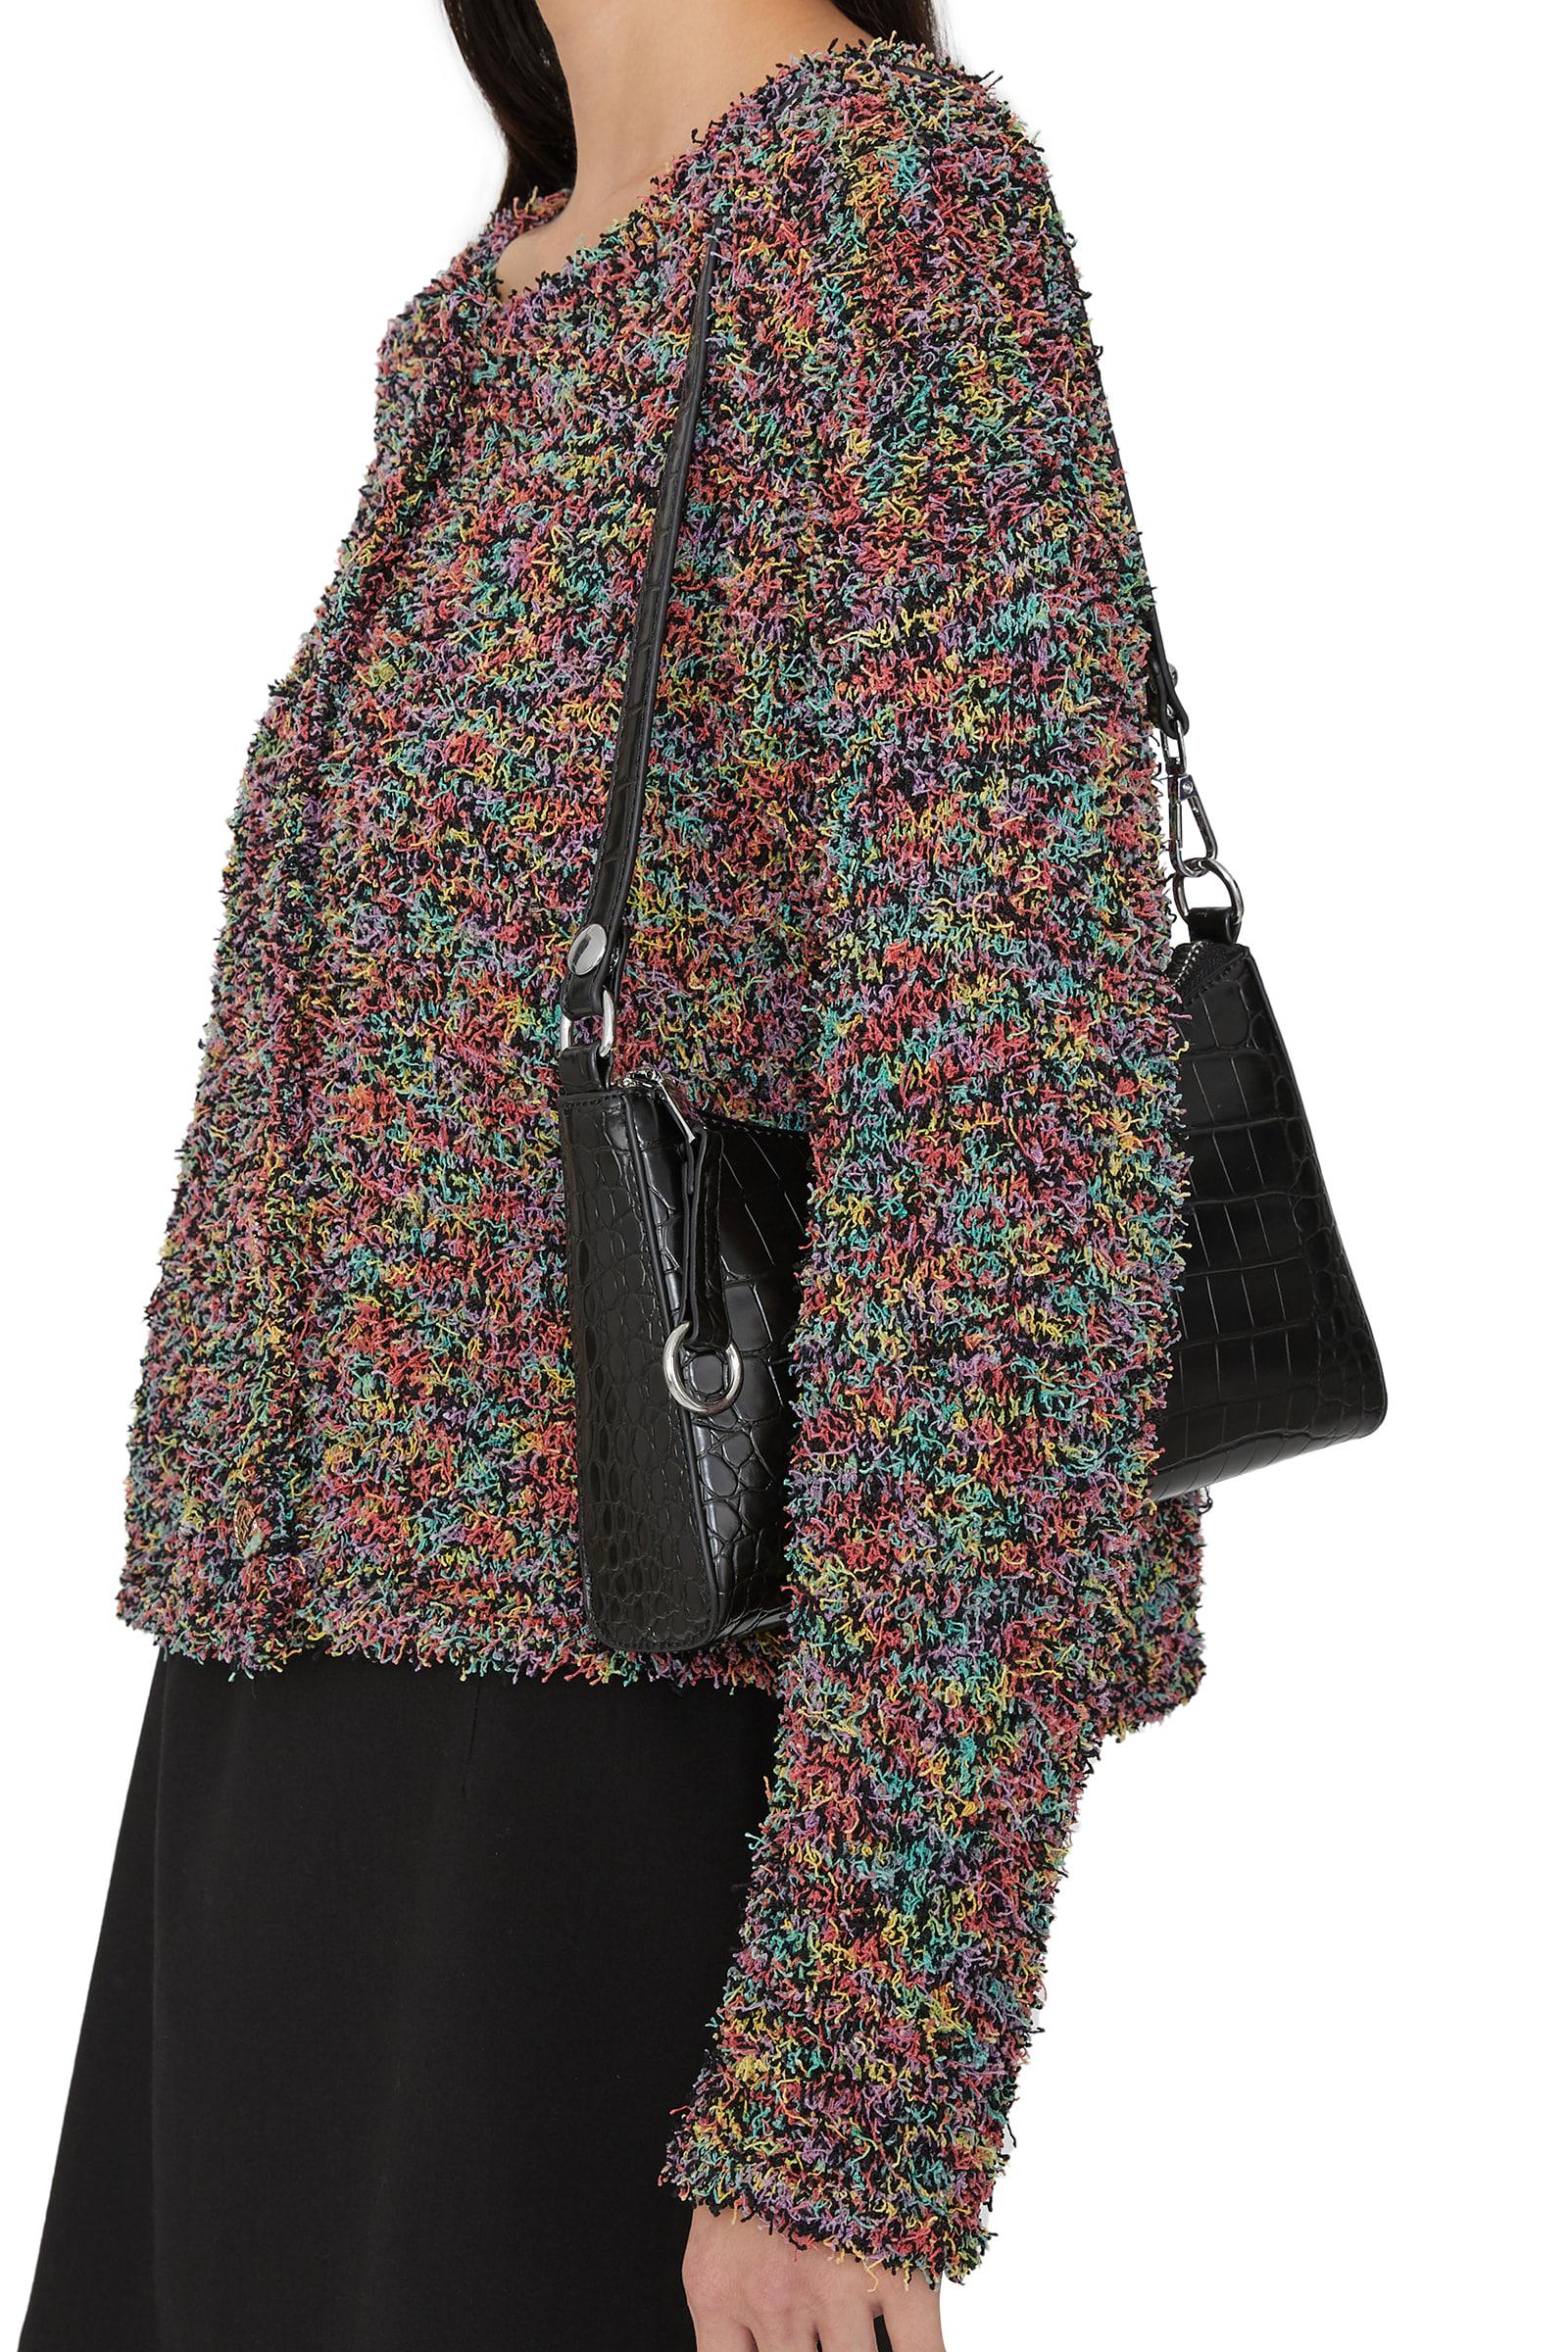 Berry animal pattern two-way shoulder bag